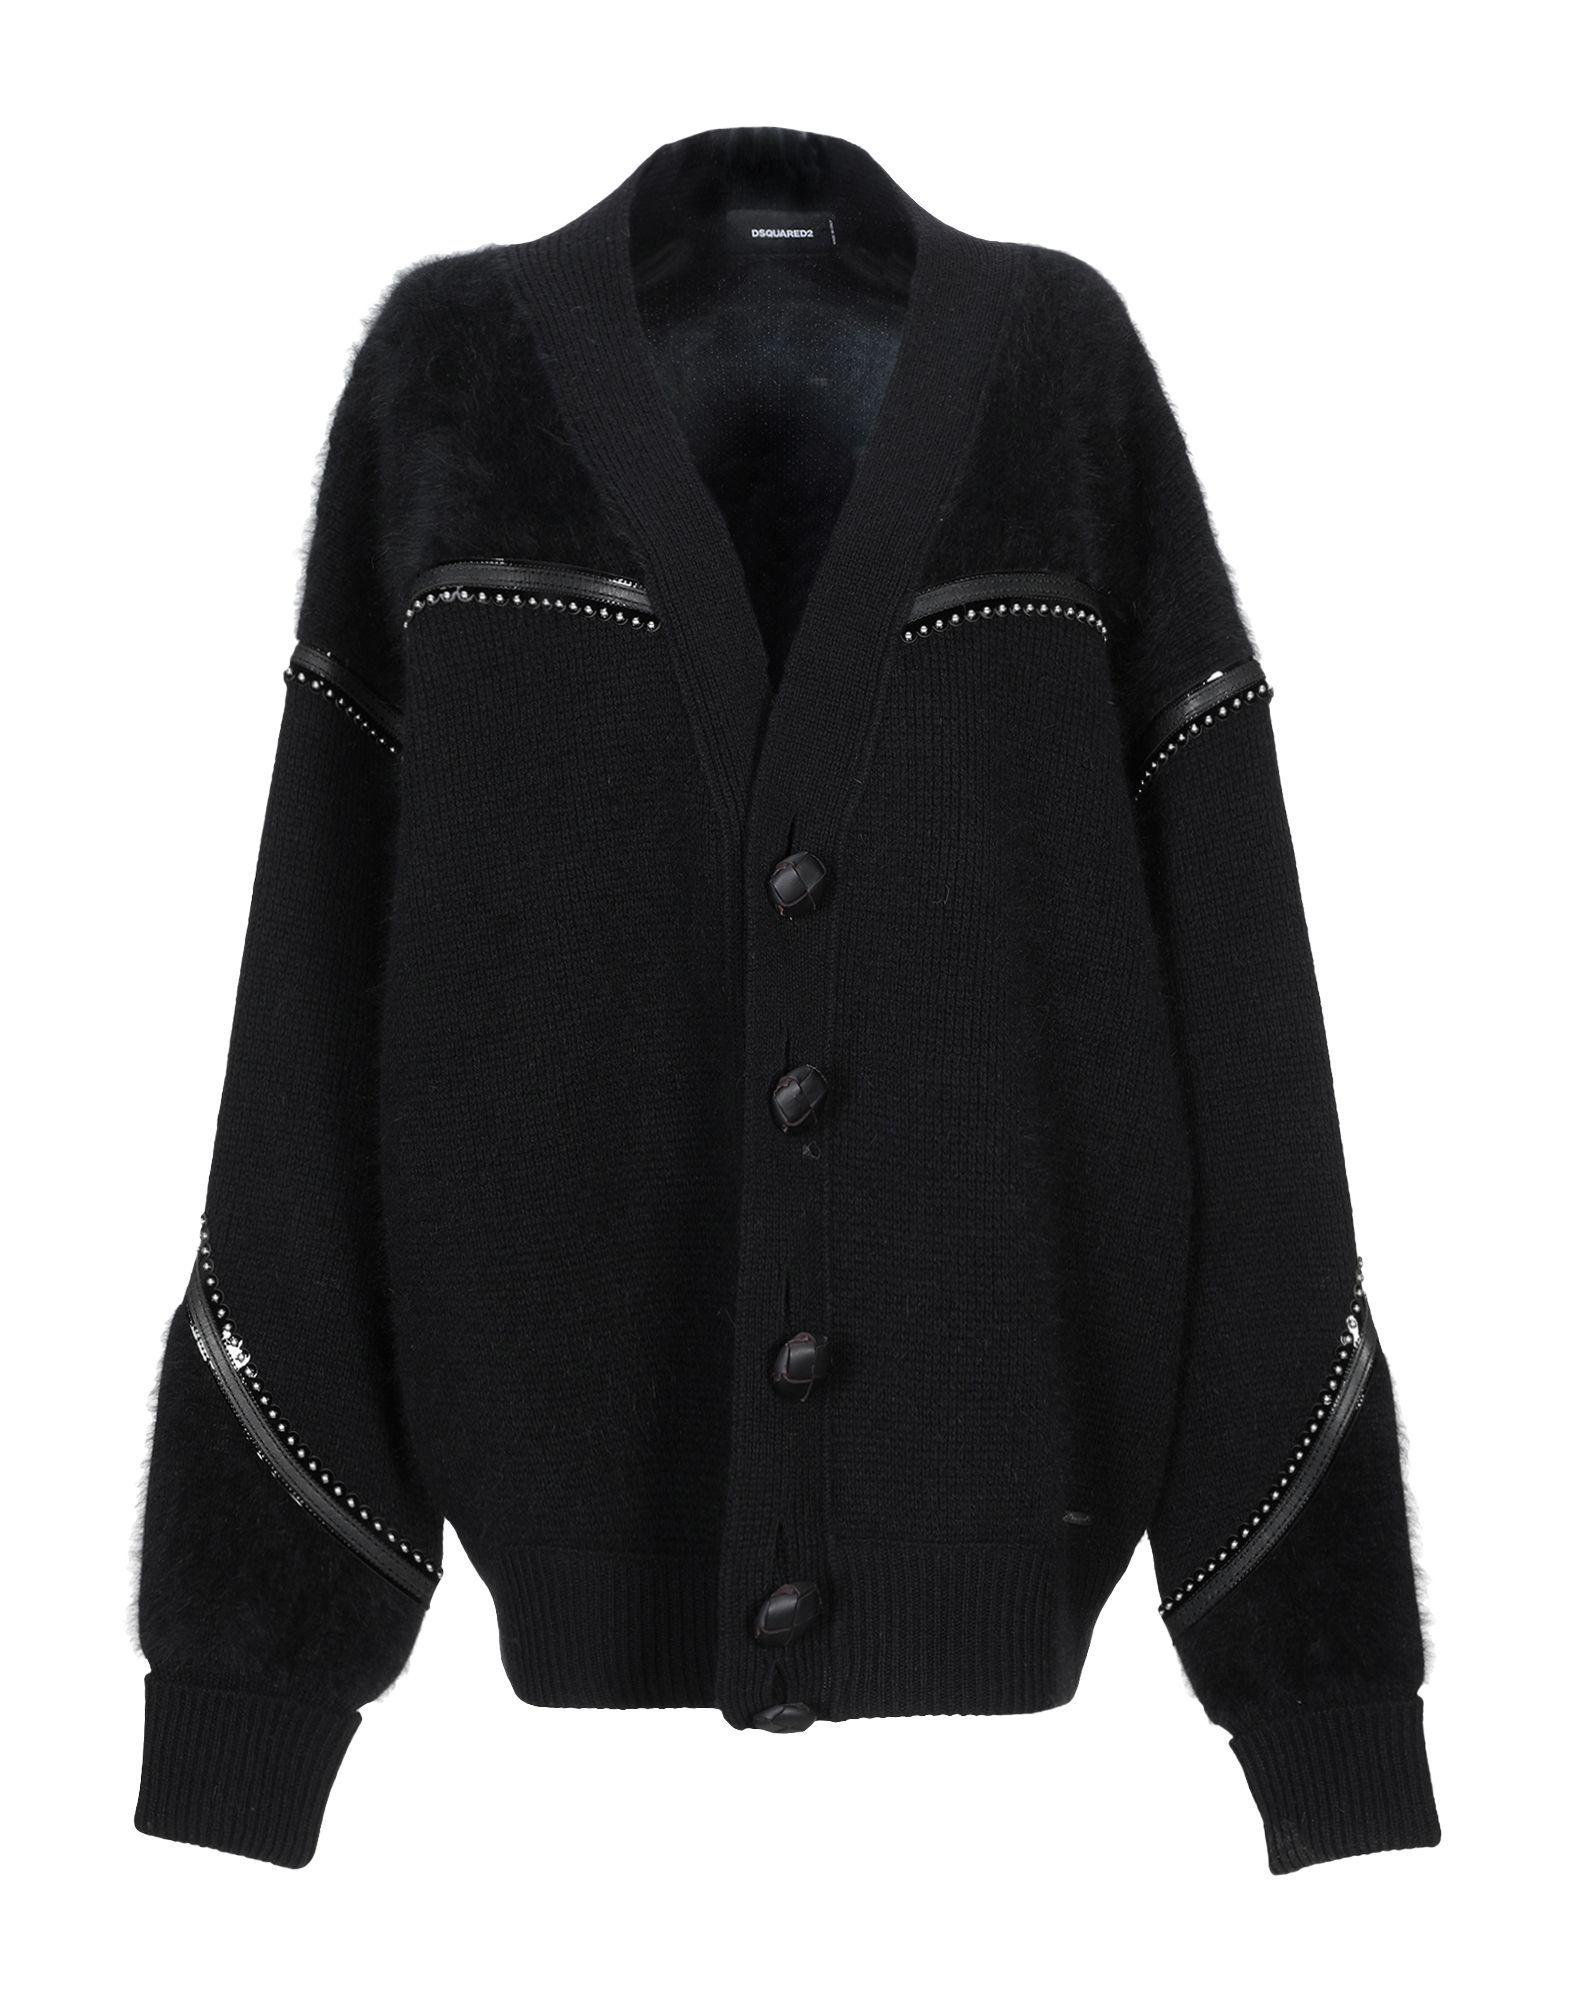 Dsquared2 Black Wool Knit